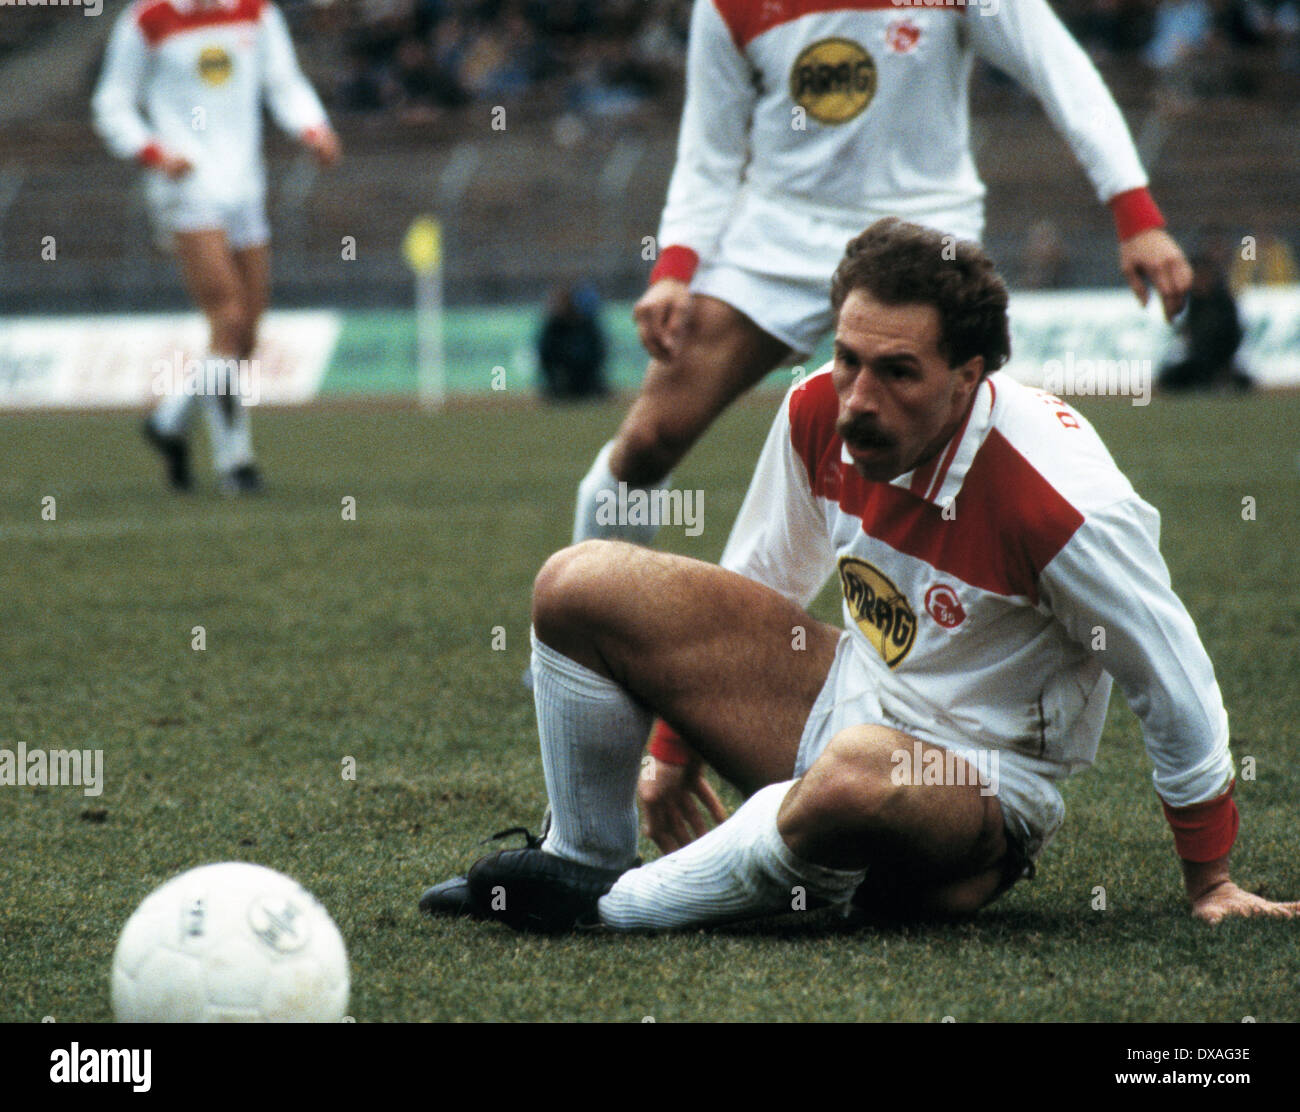 football, Bundesliga, 1984/1985, Rhine Stadium, Fortuna Duesseldorf versus FC Bayer 05 Uerdingen 2:2, scene of the match, Peter Loehr (Fortuna) sitting aground - Stock Image